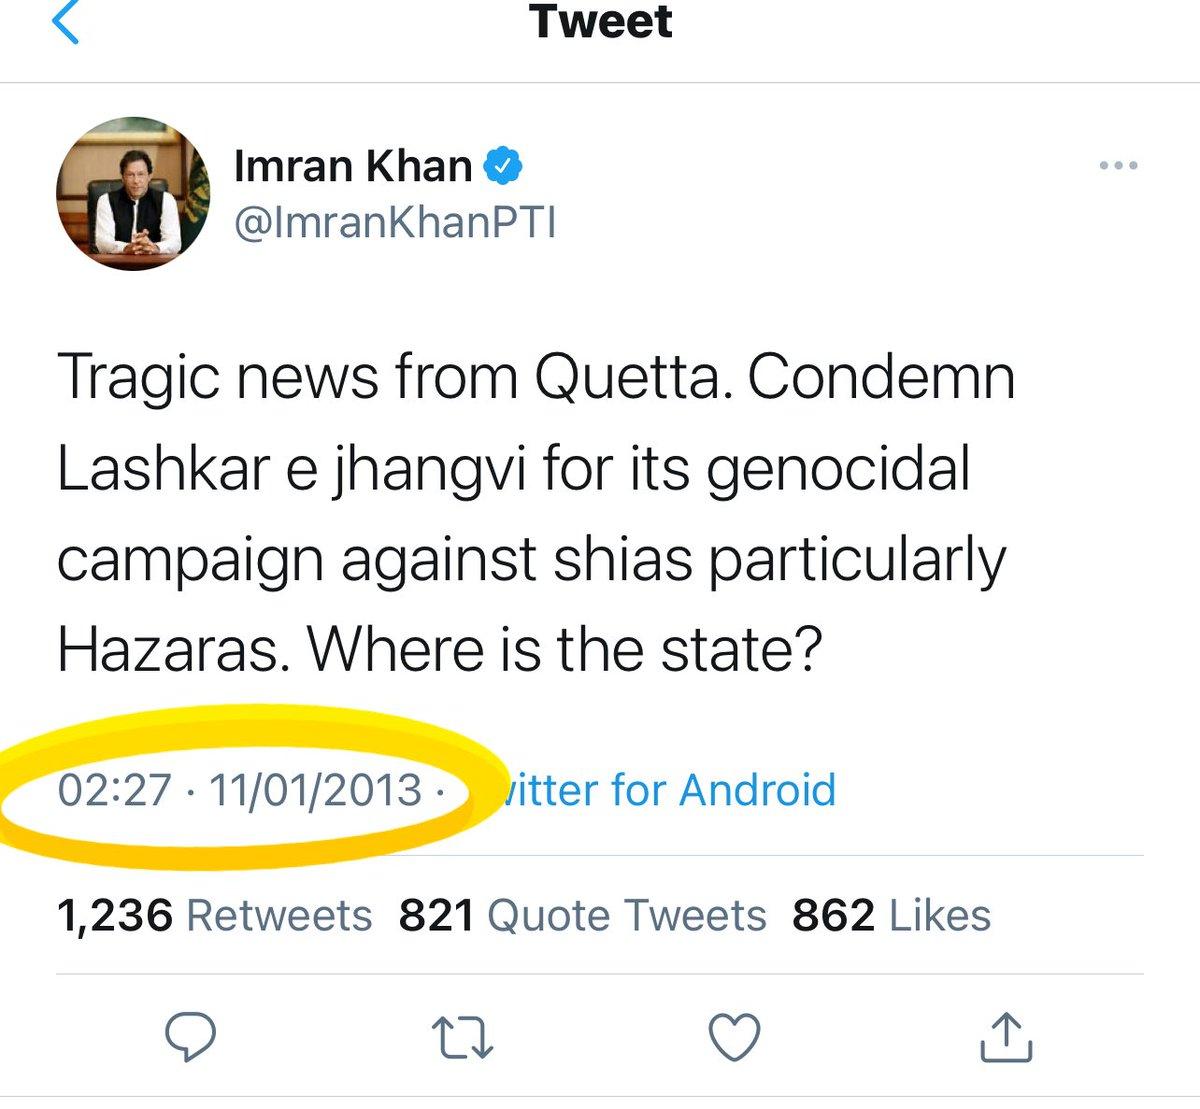 @ImranKhanPTI What is this